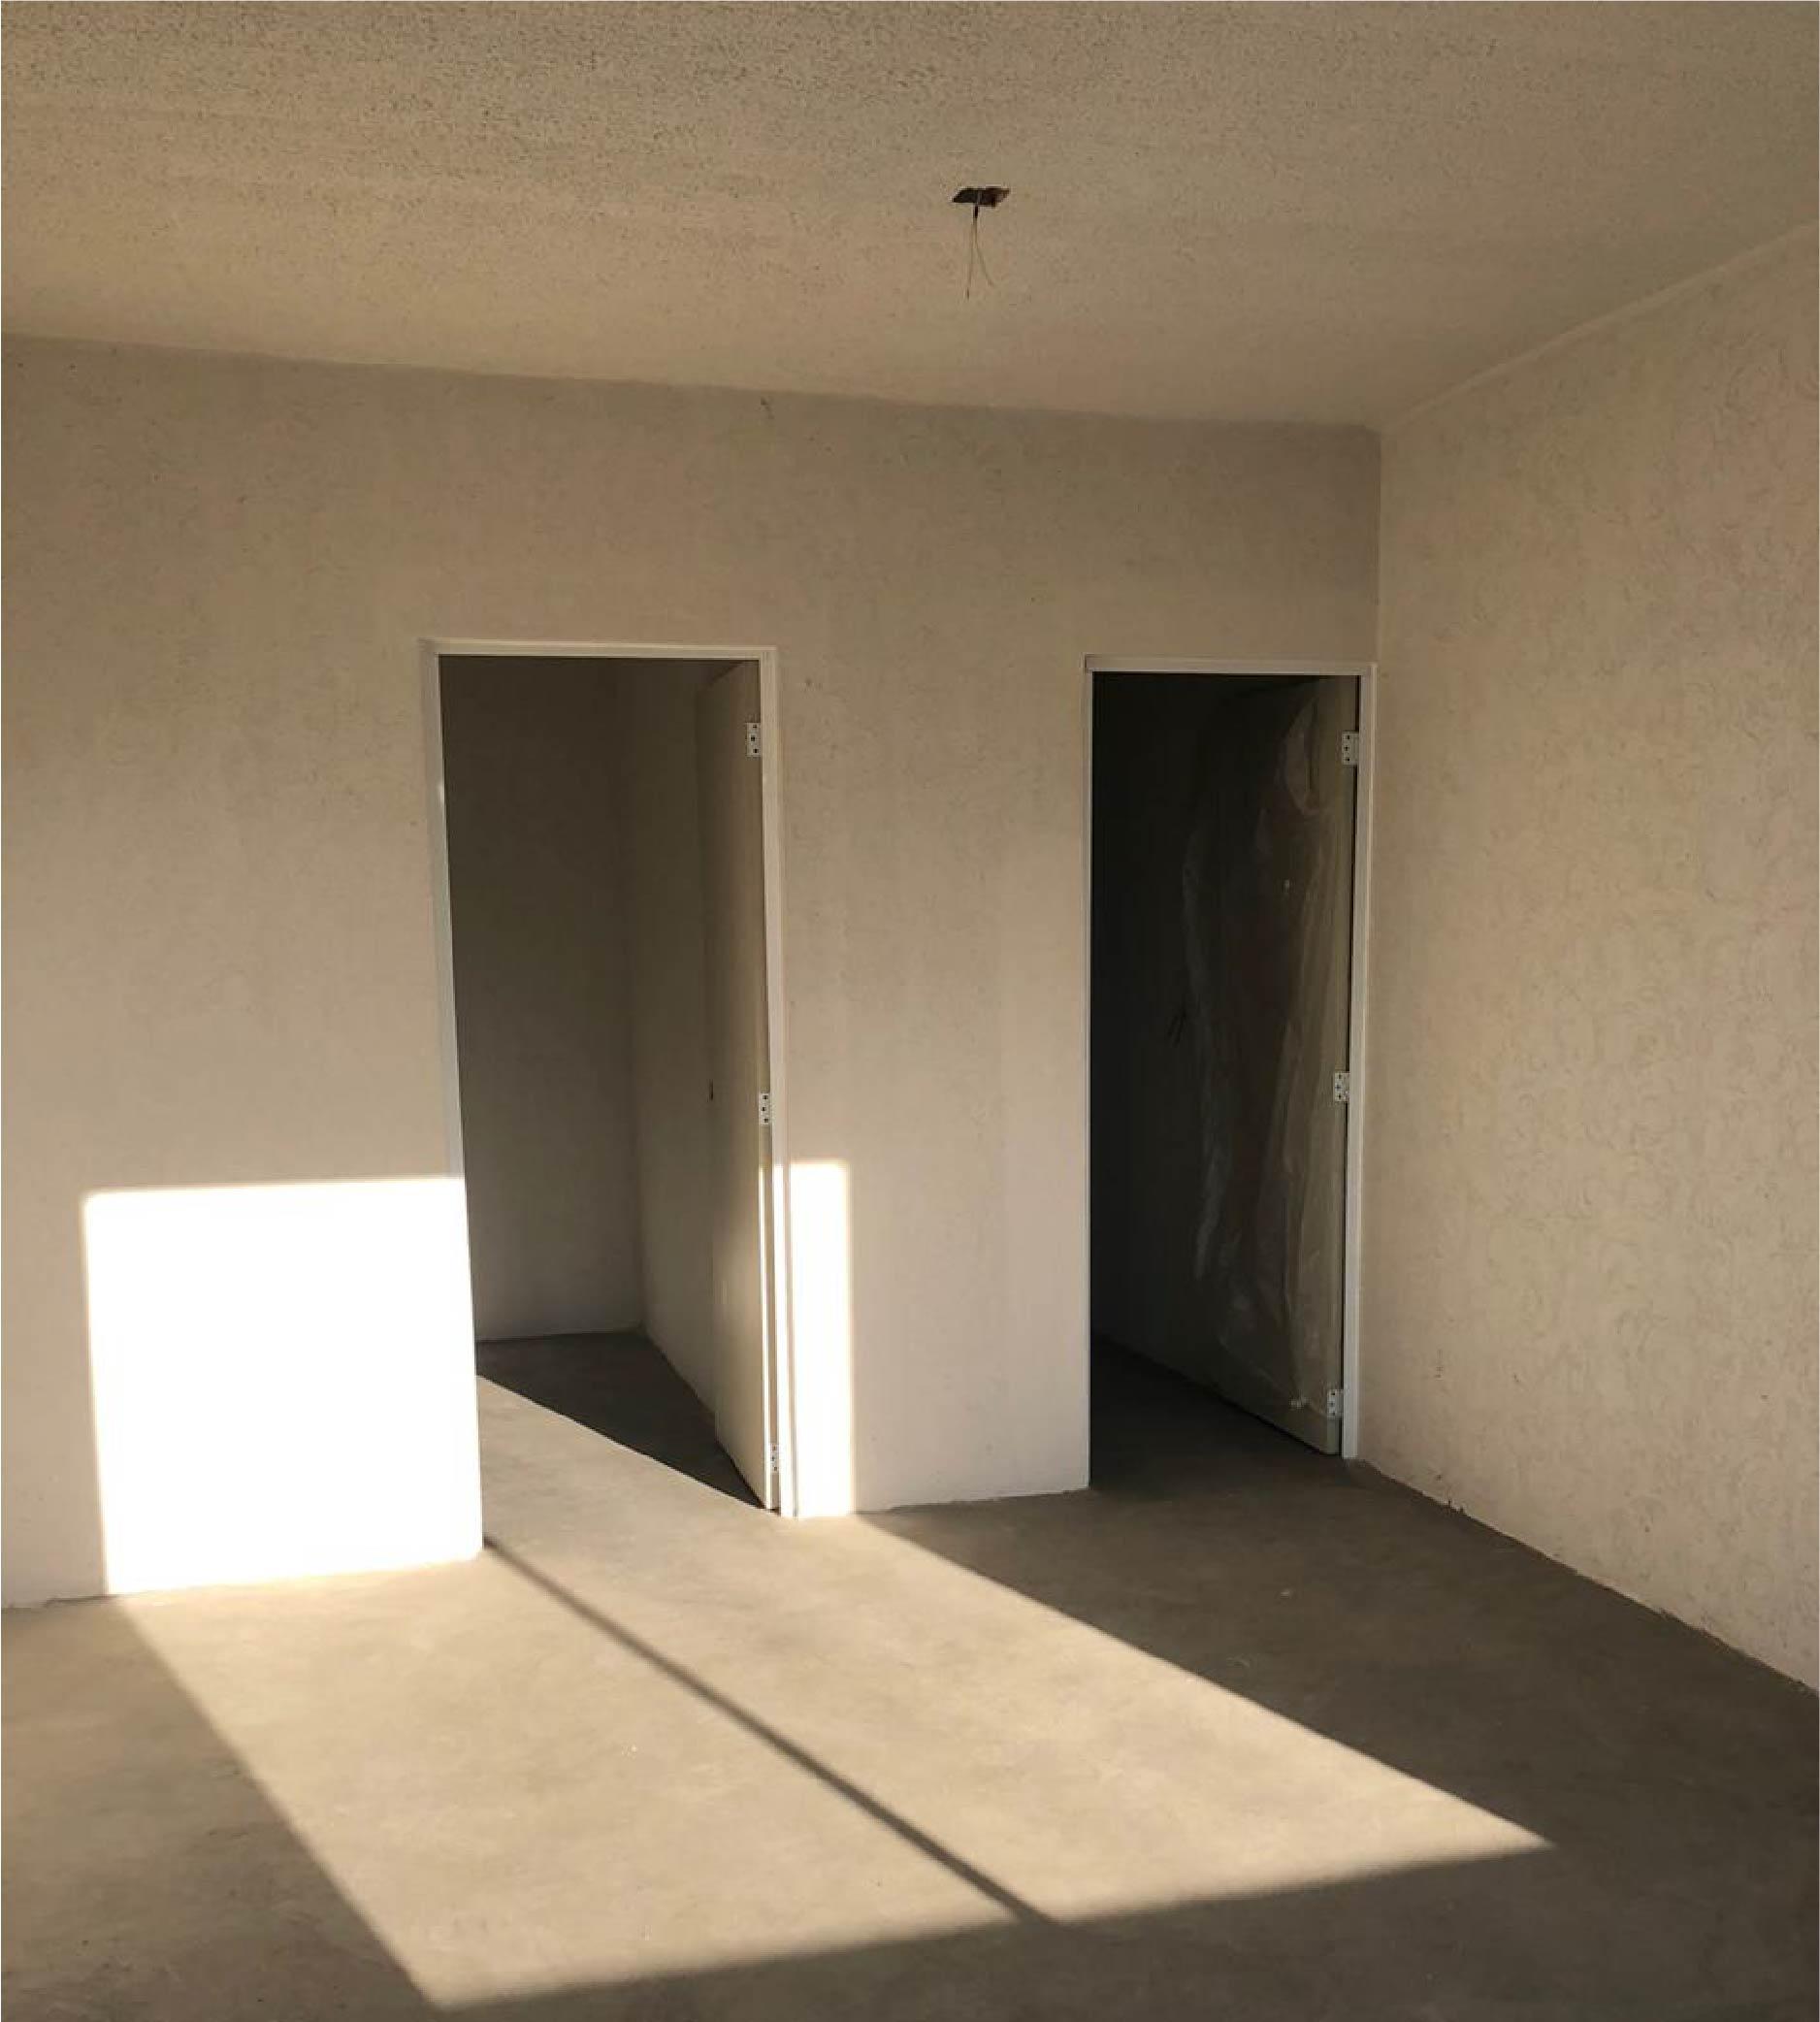 VILLA ARAGONEZ- C09 CELAYA- venta de casas infonavit en celaya-15